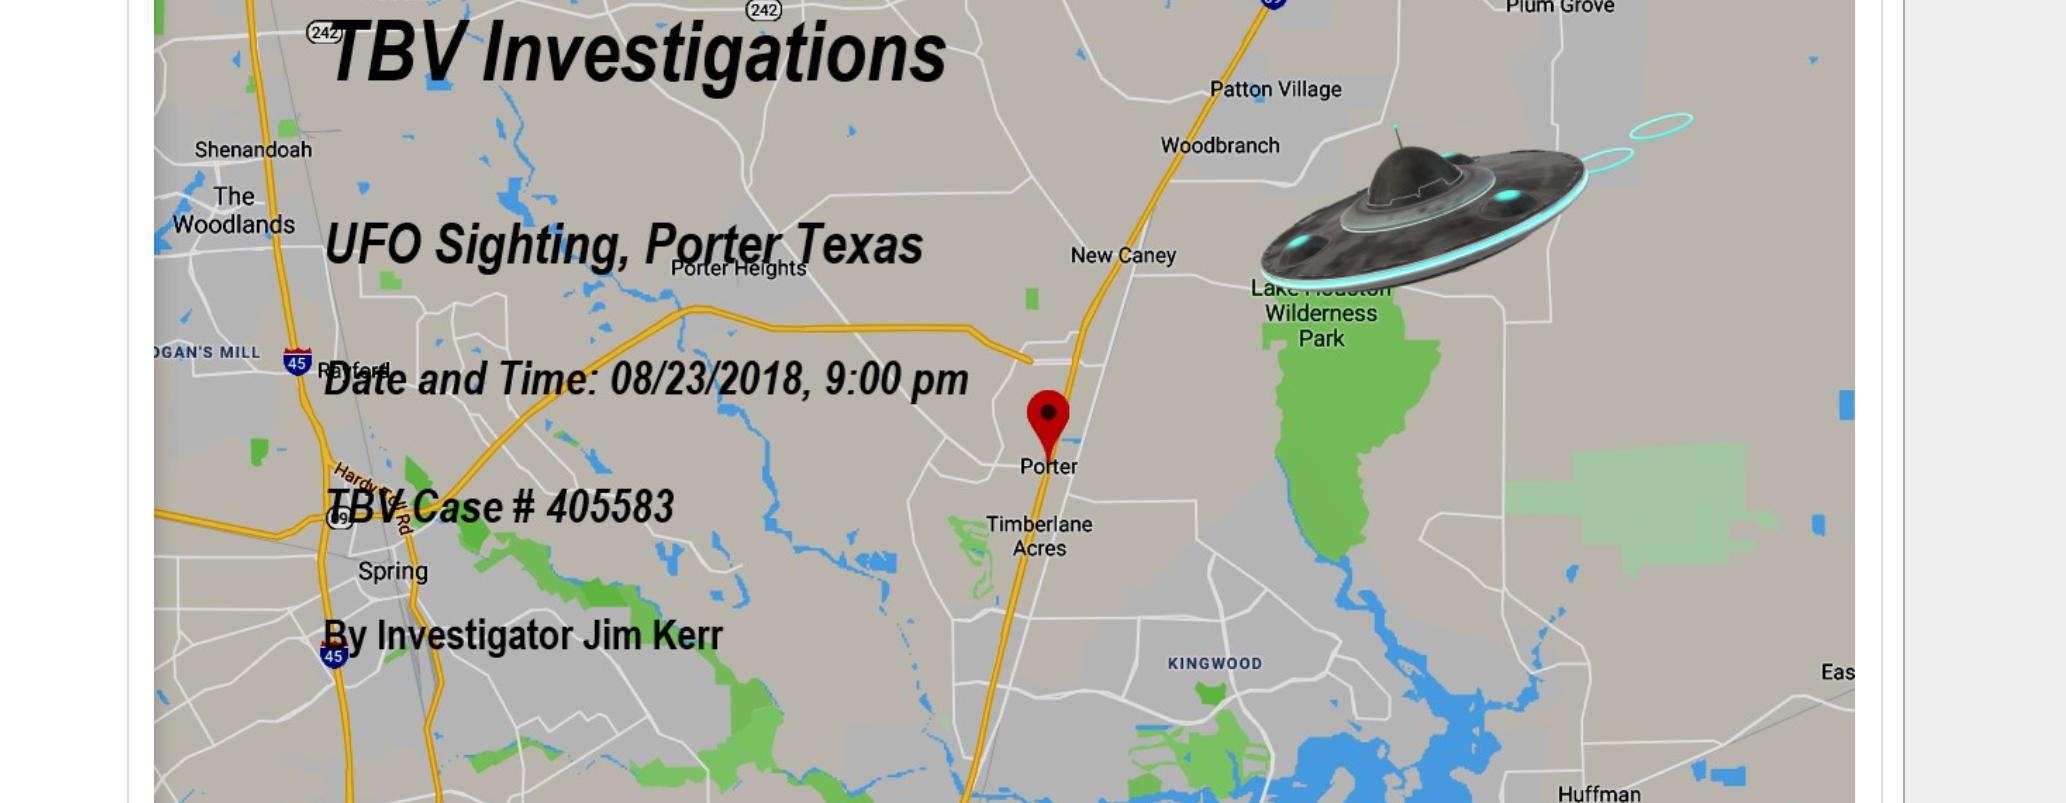 Ufo Over Porter, Texas – August 23, 2018 - The Black Vault Case Files - Porter Texas Map